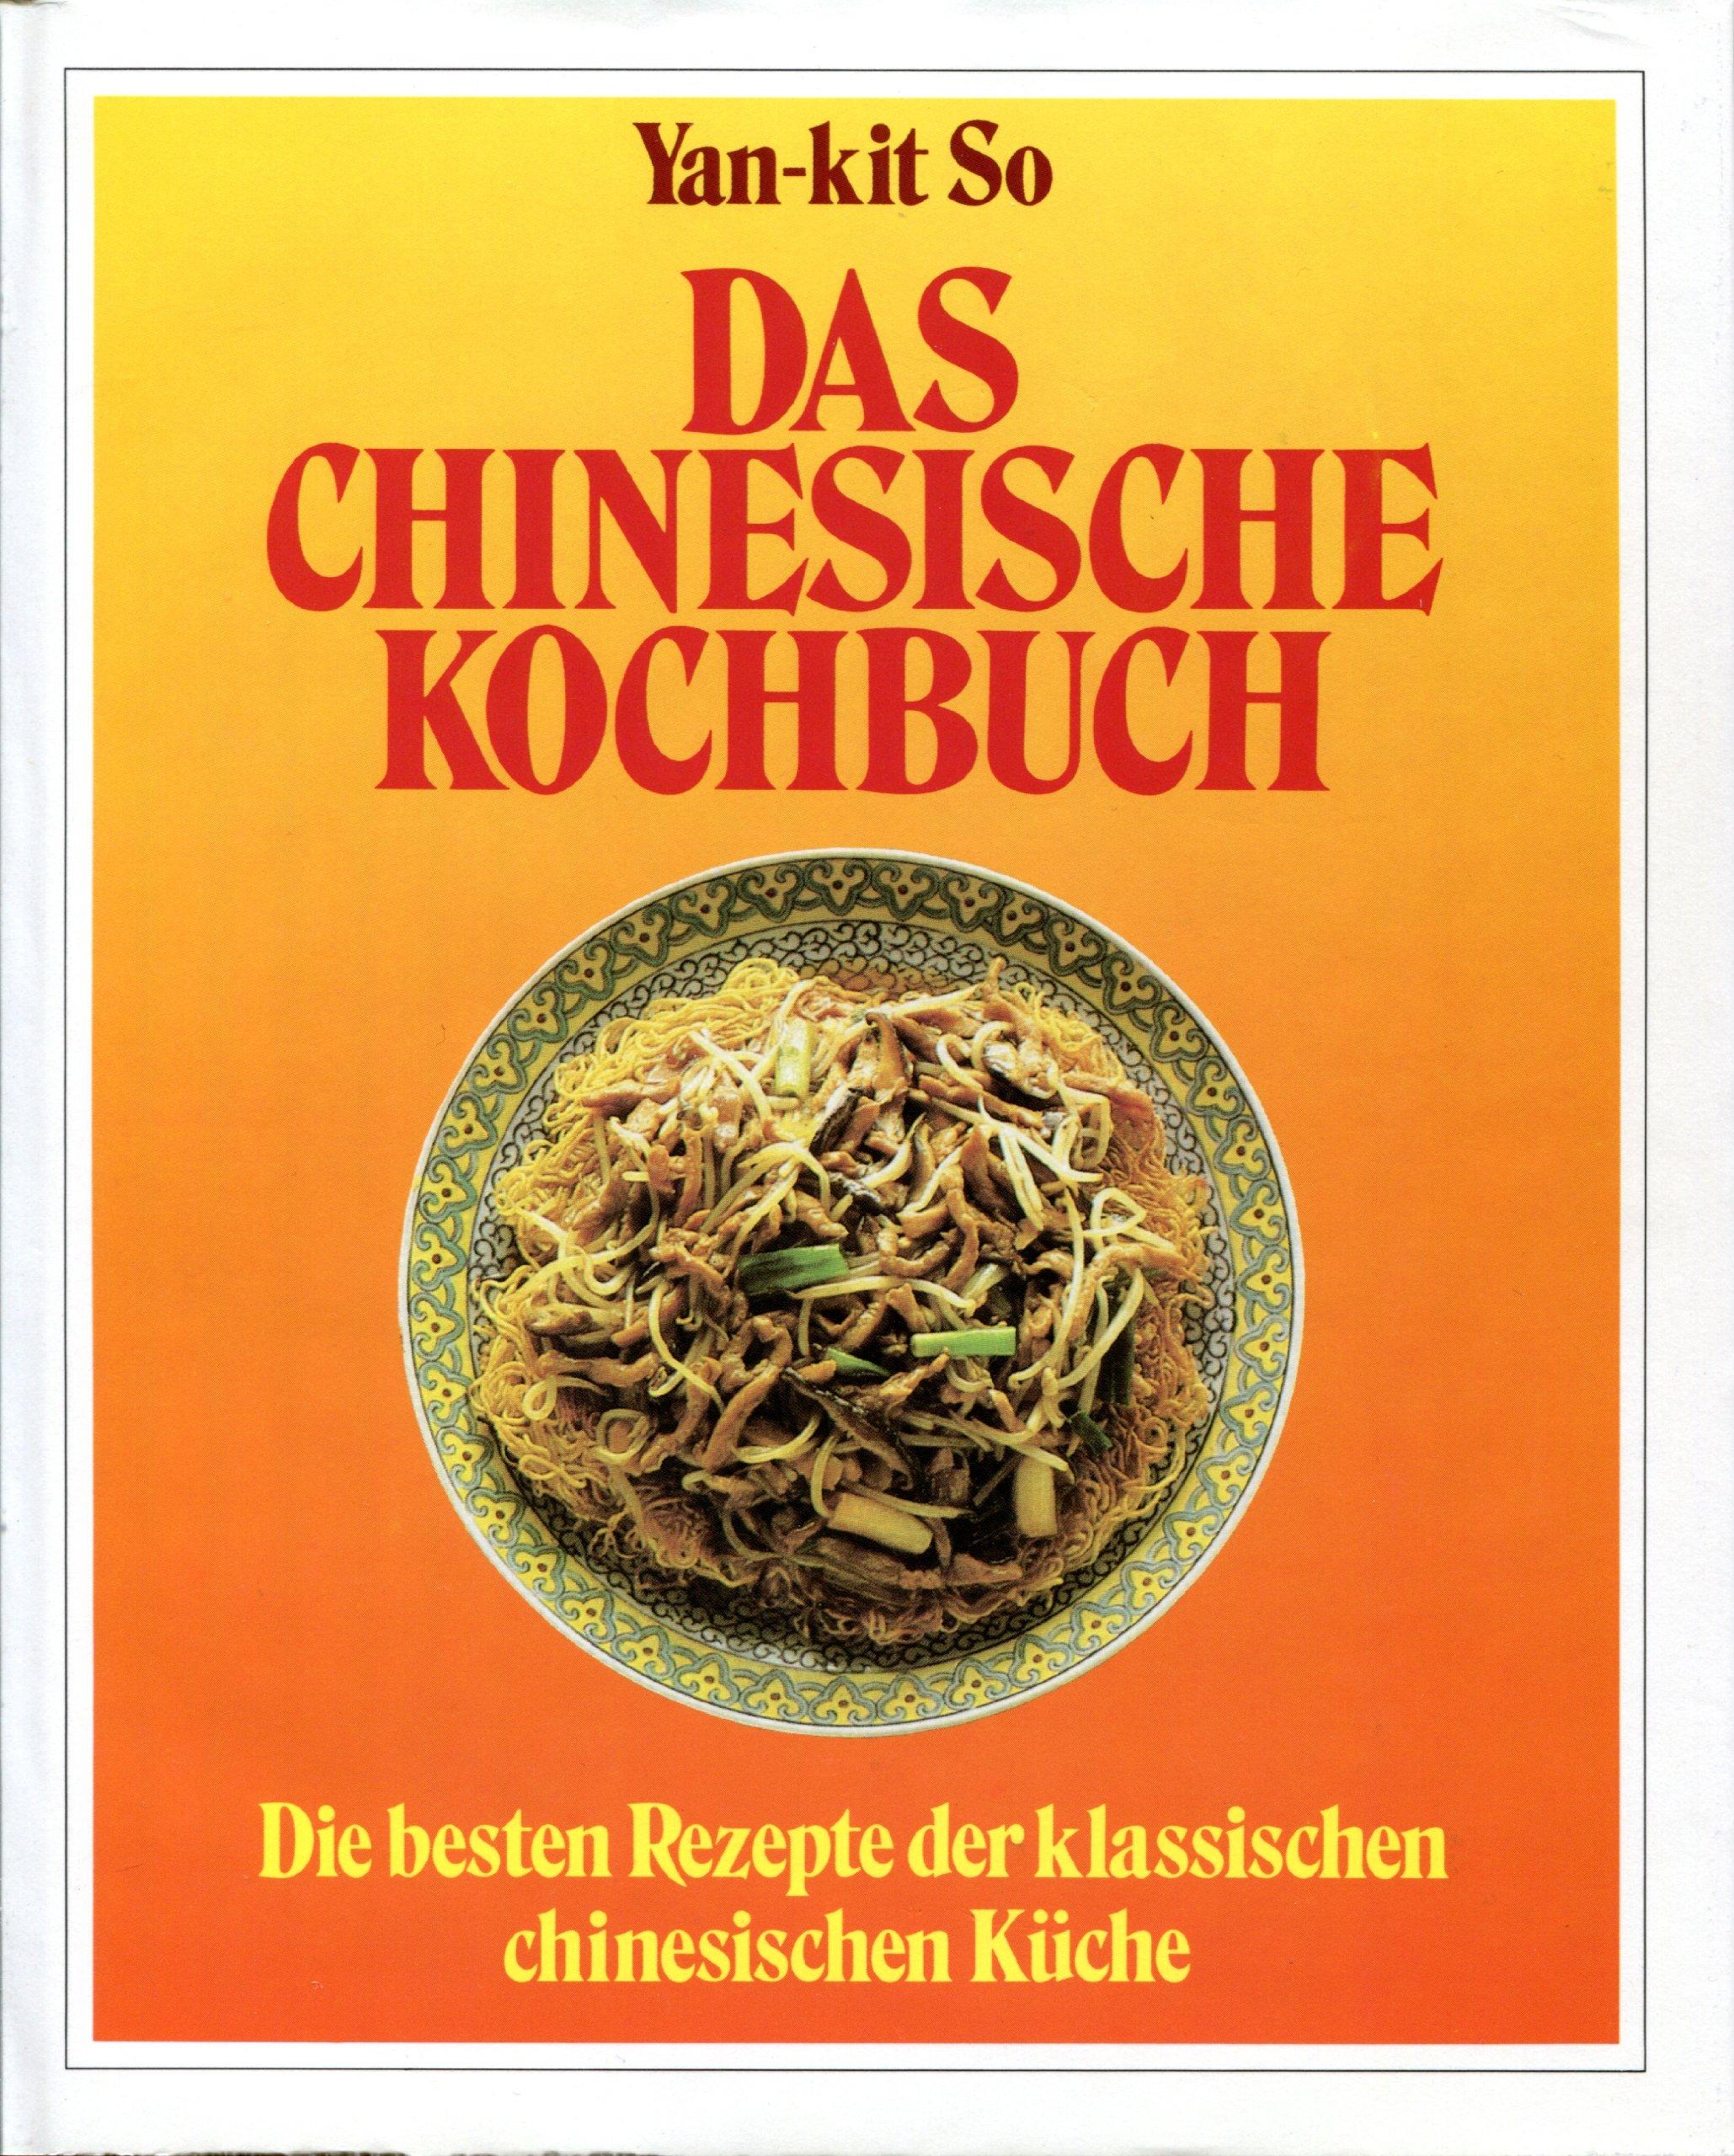 Das Chinesische Kochbuch: Amazon.de: Yan-kit So: Bücher